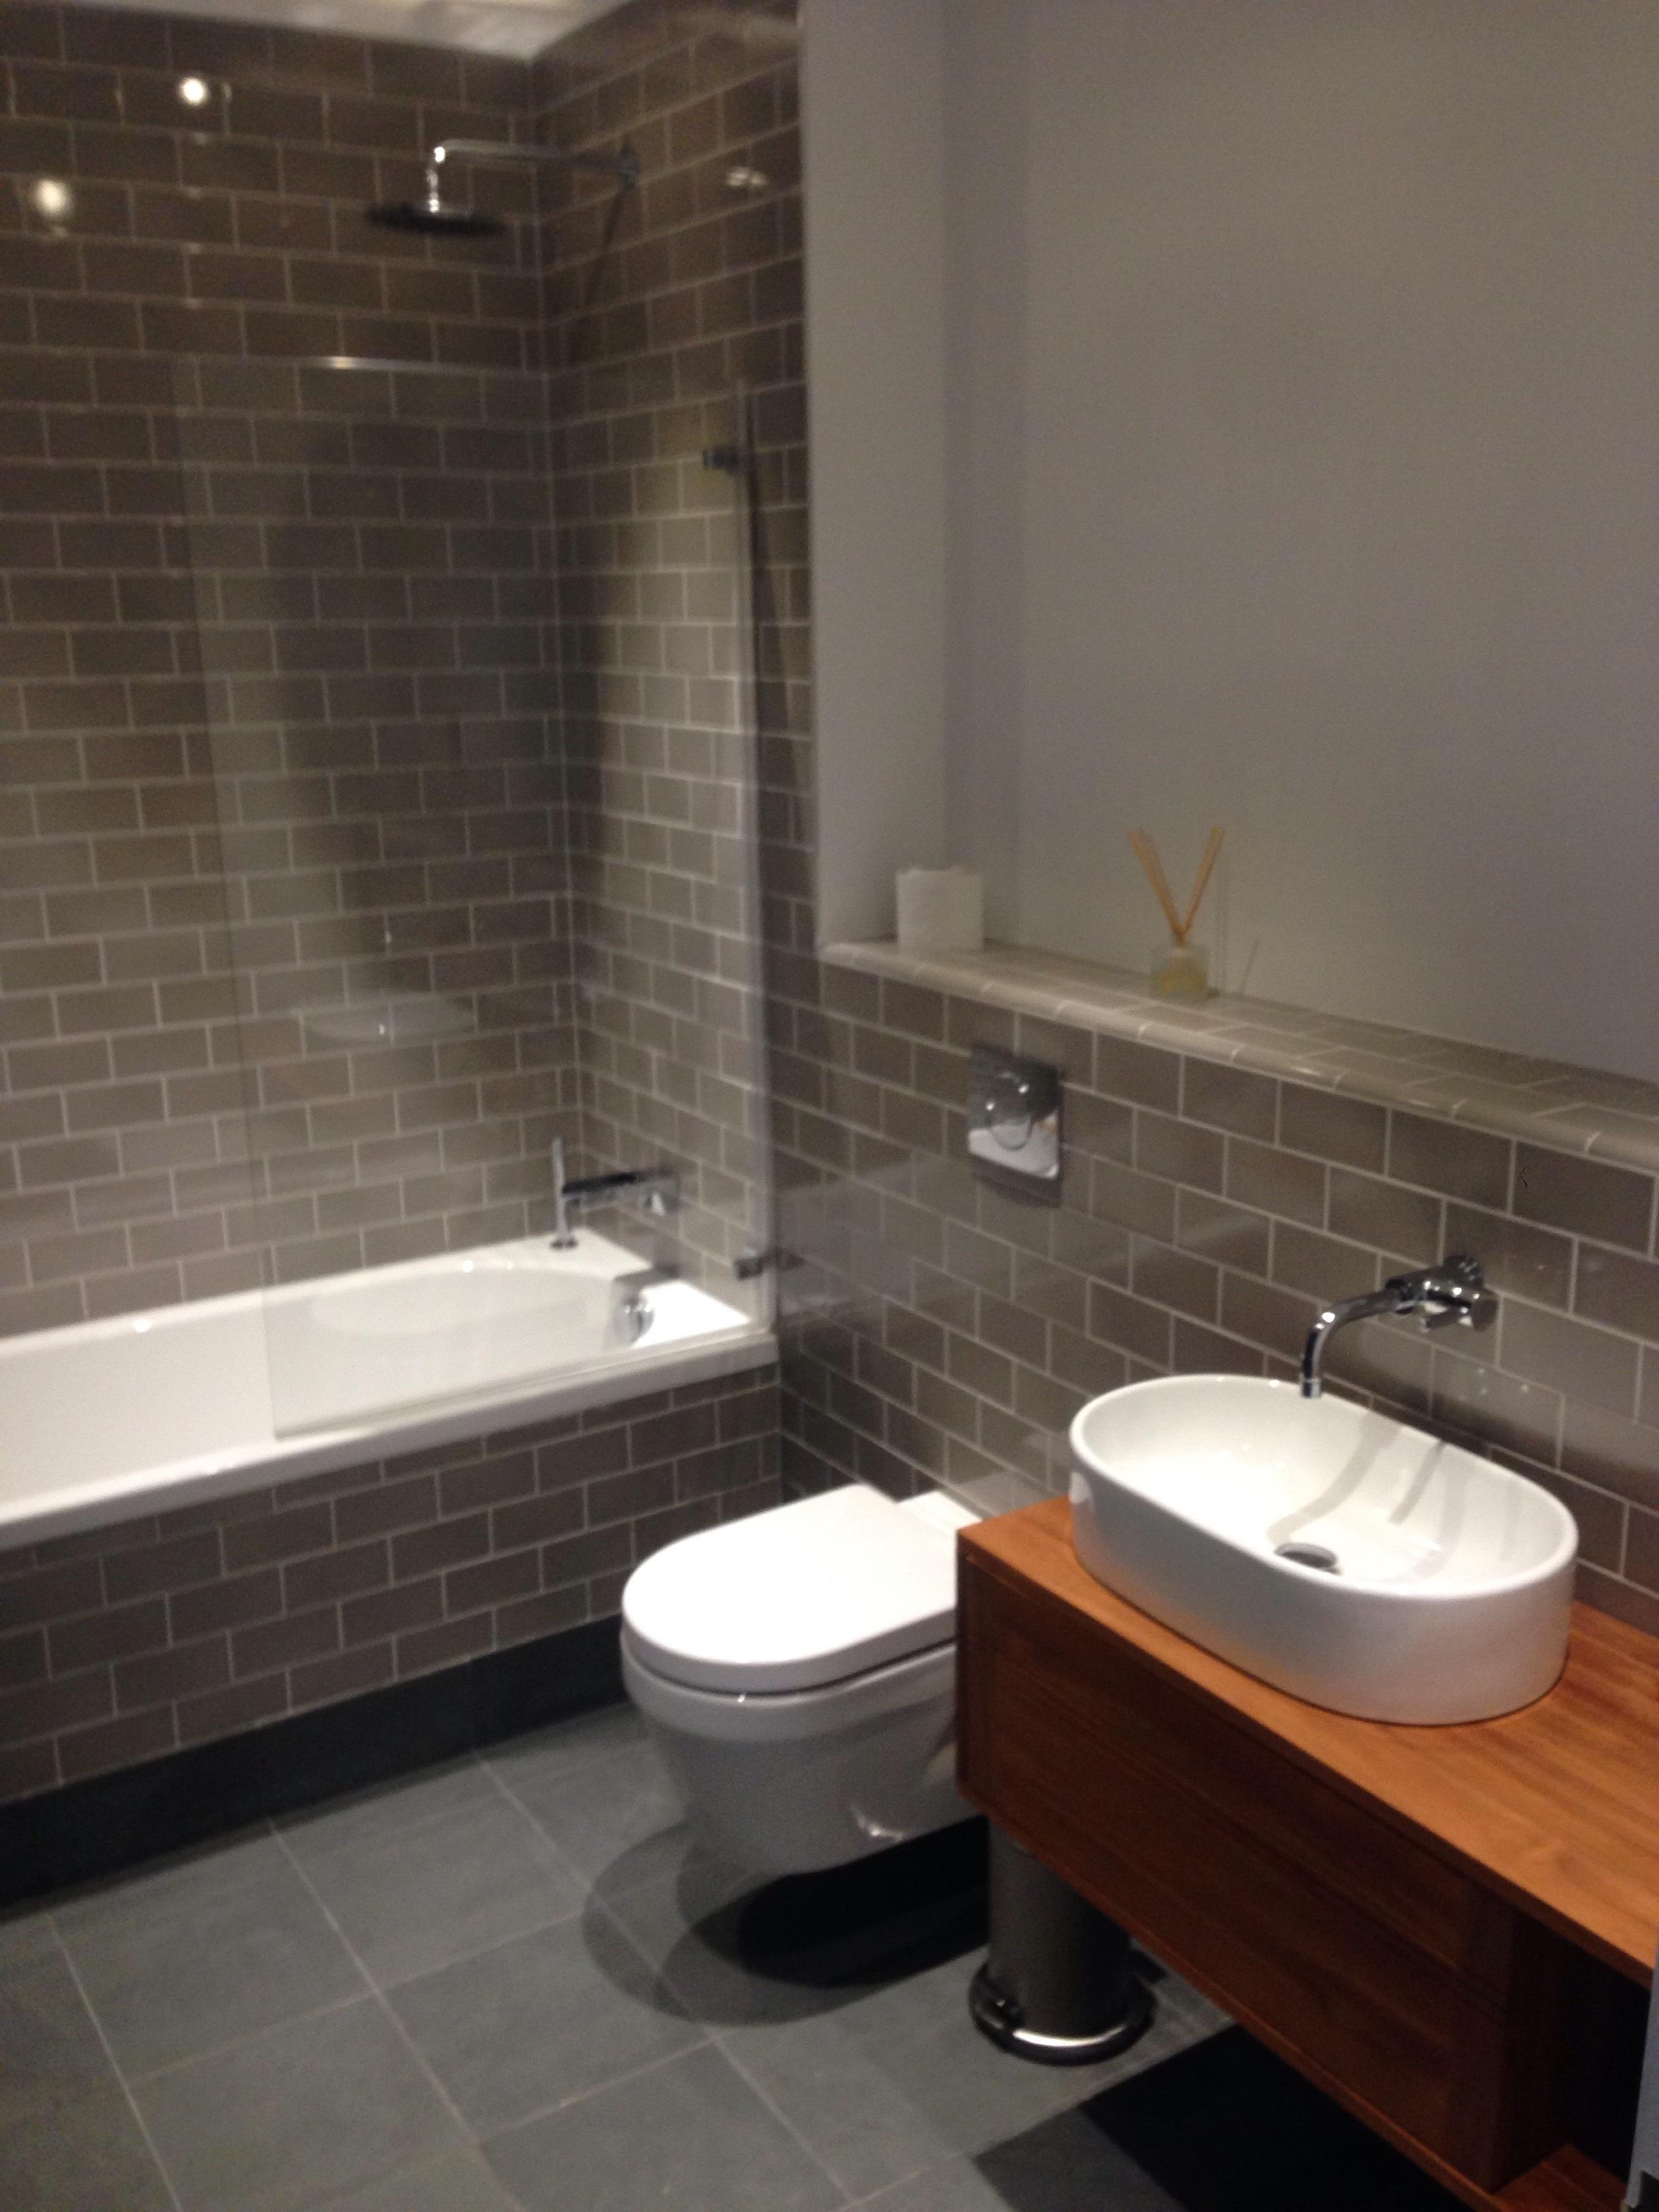 Full bathroom installation - Full Bathroom Installation Nbsp Full Bathroom Installation